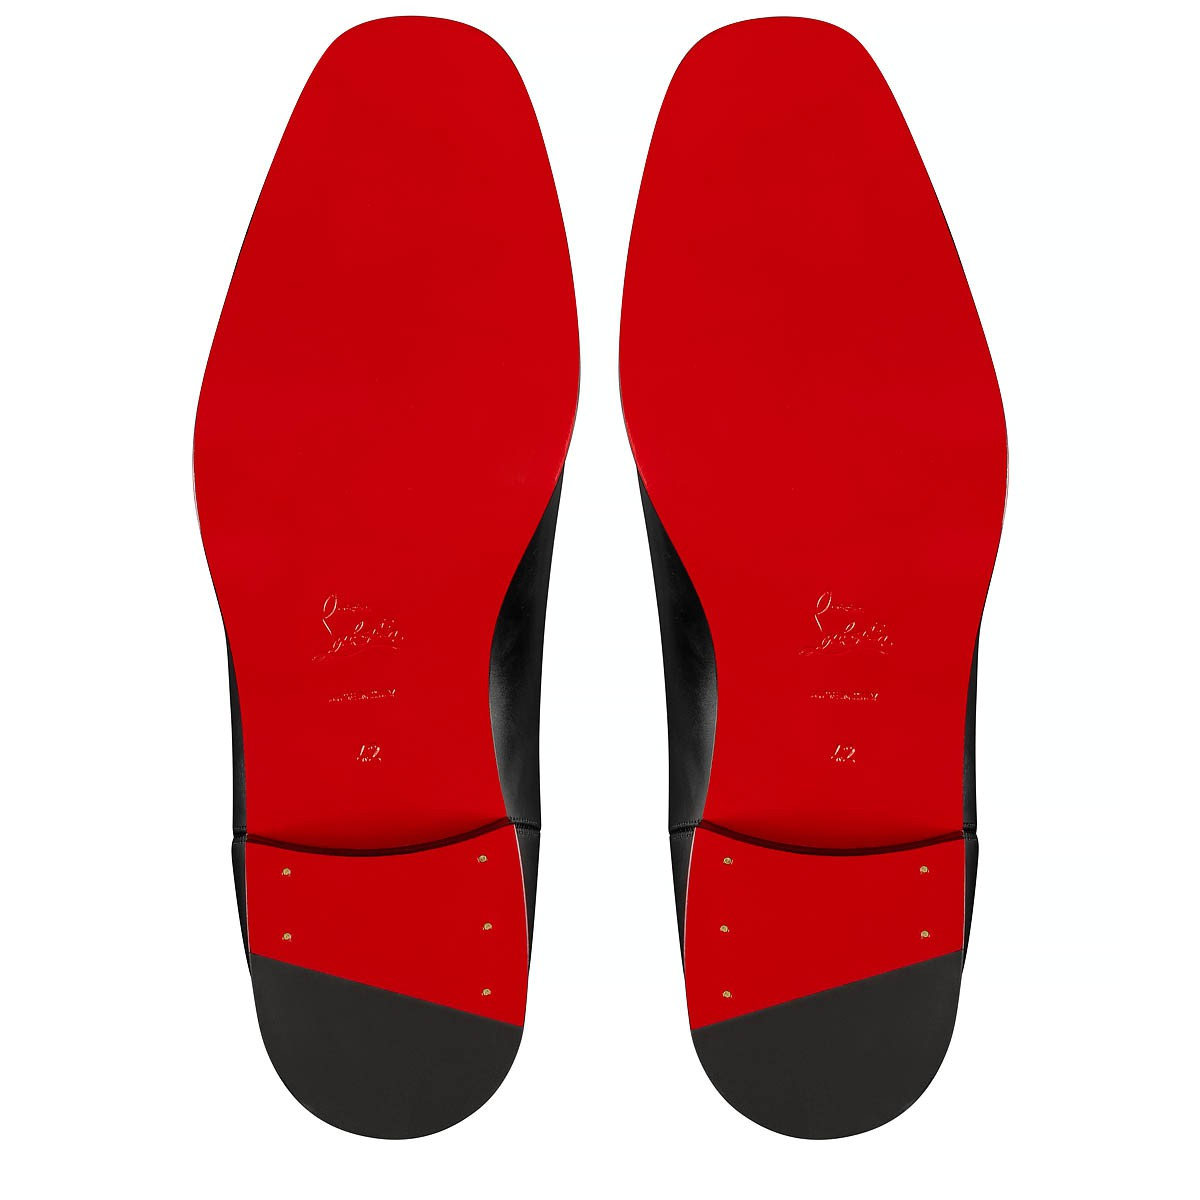 Shoes - Samson - Christian Louboutin